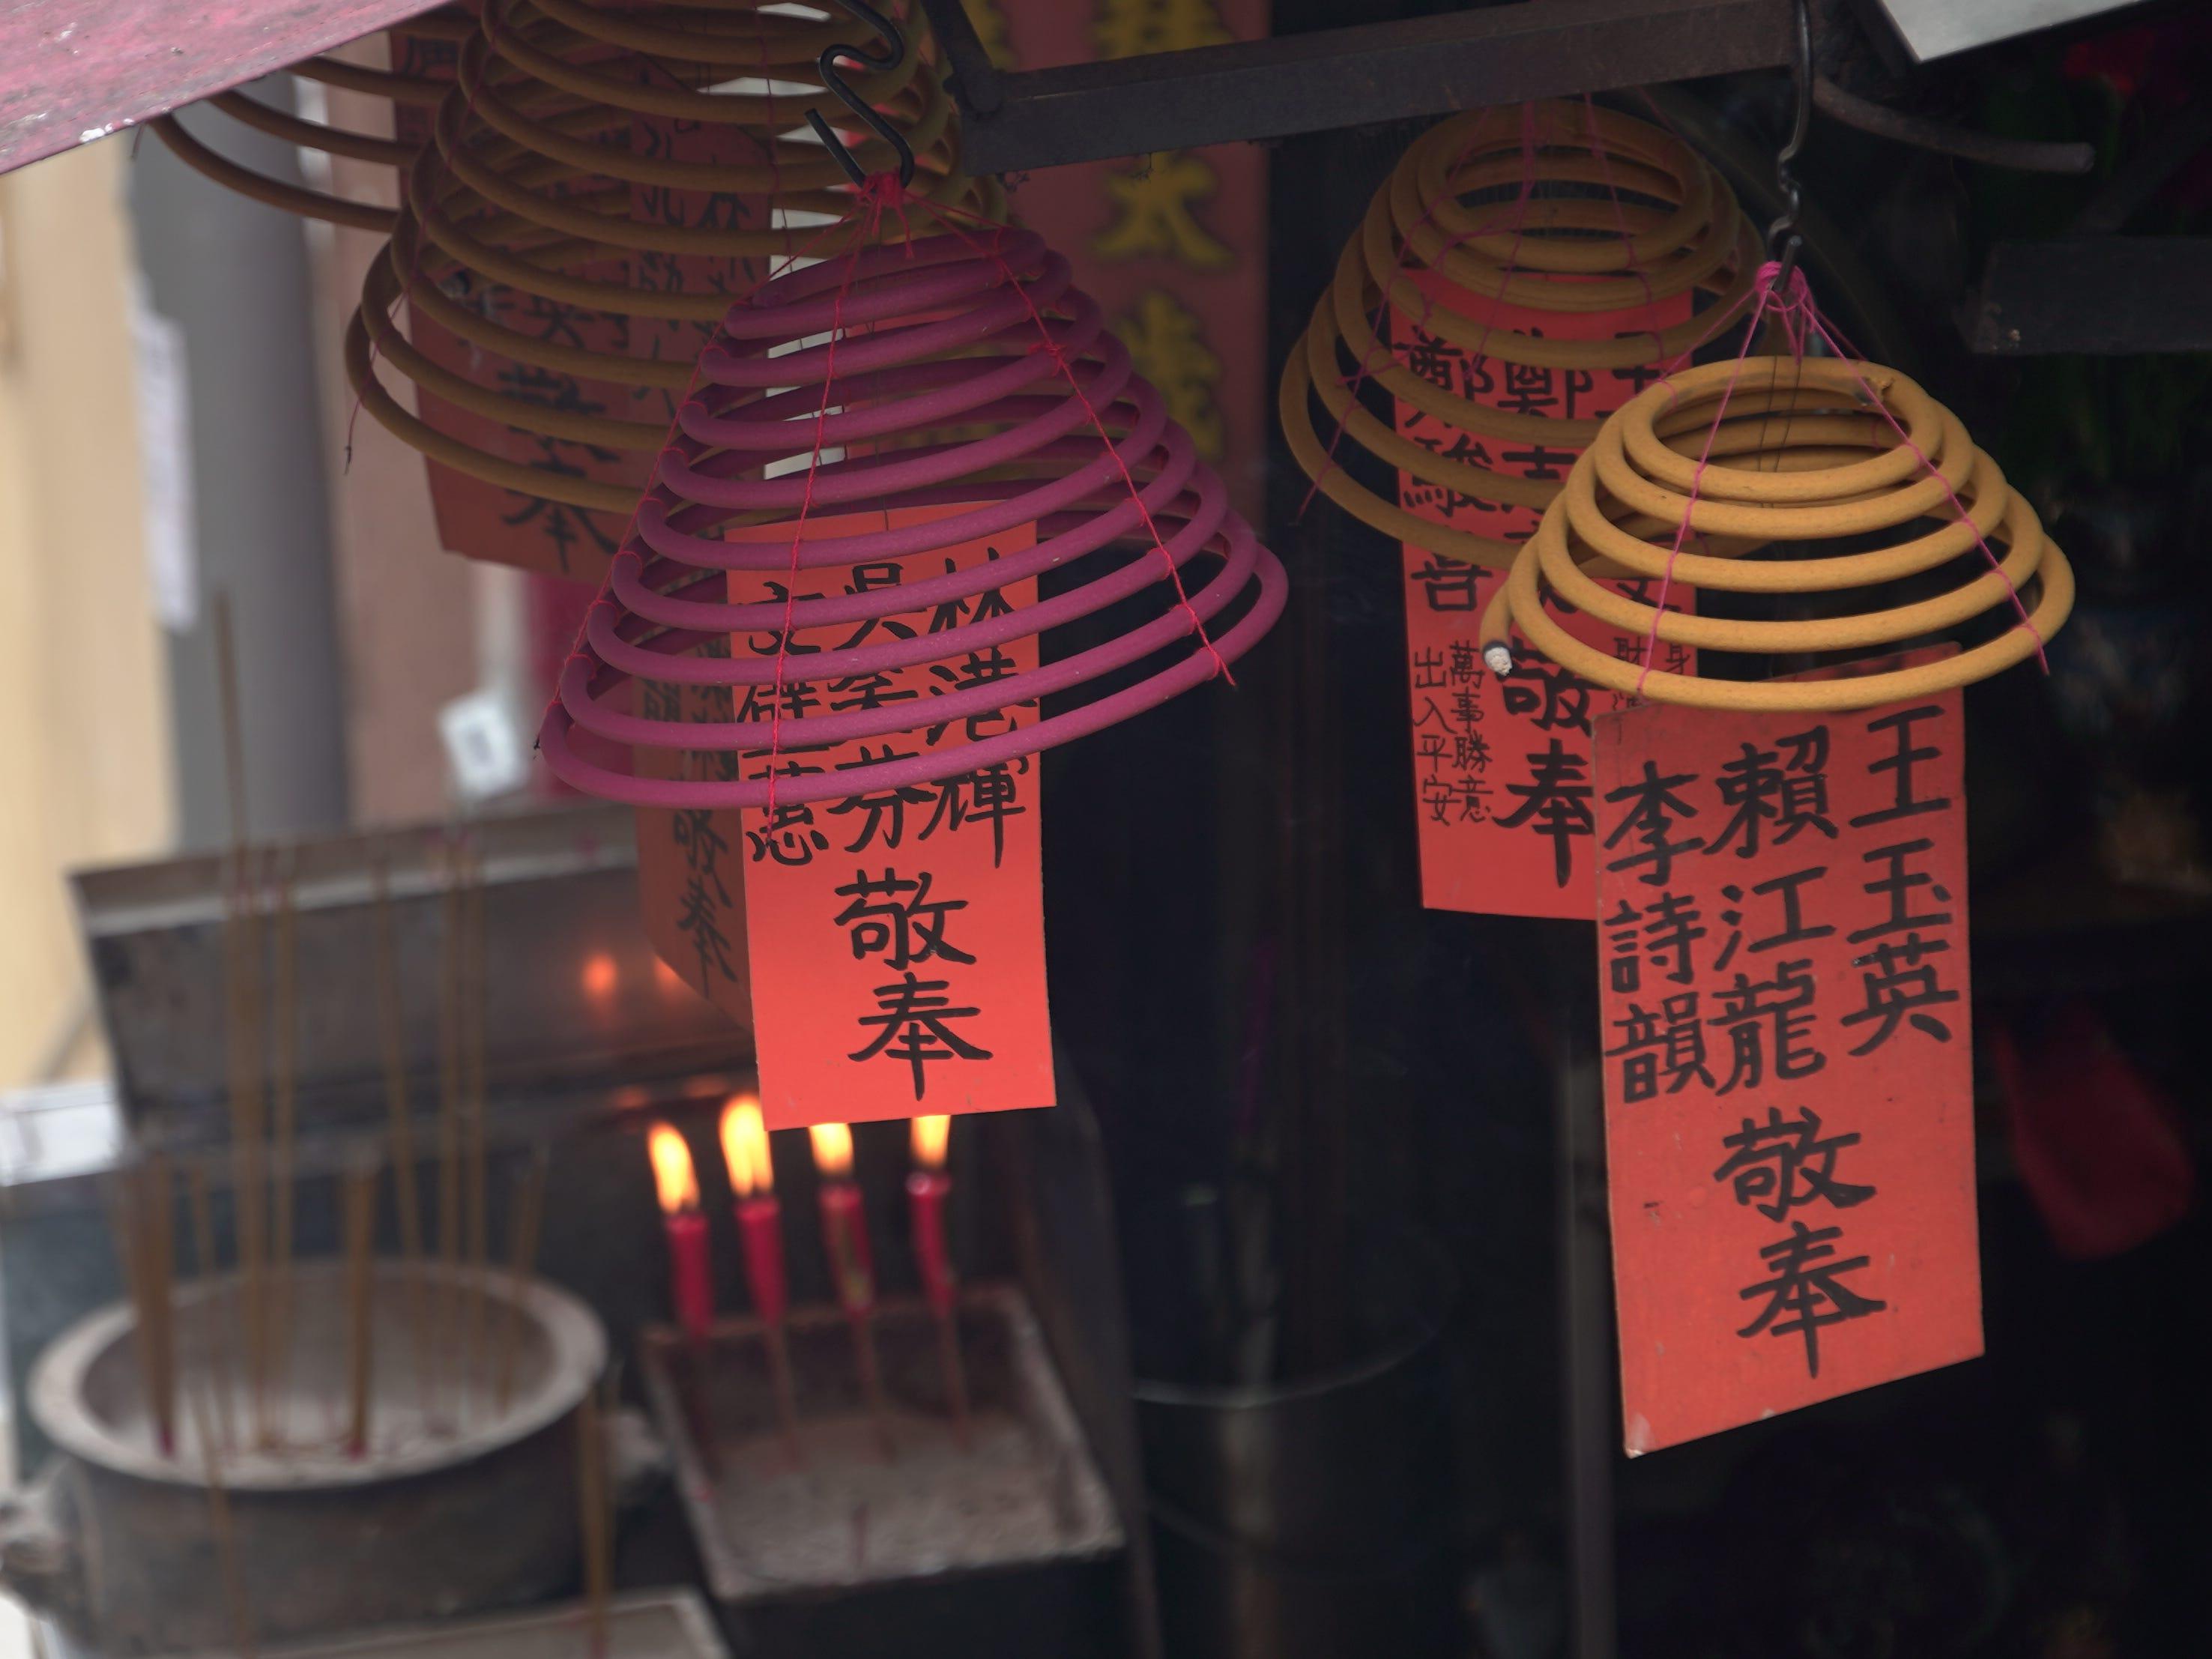 Incense inside a Hong Kong temple.